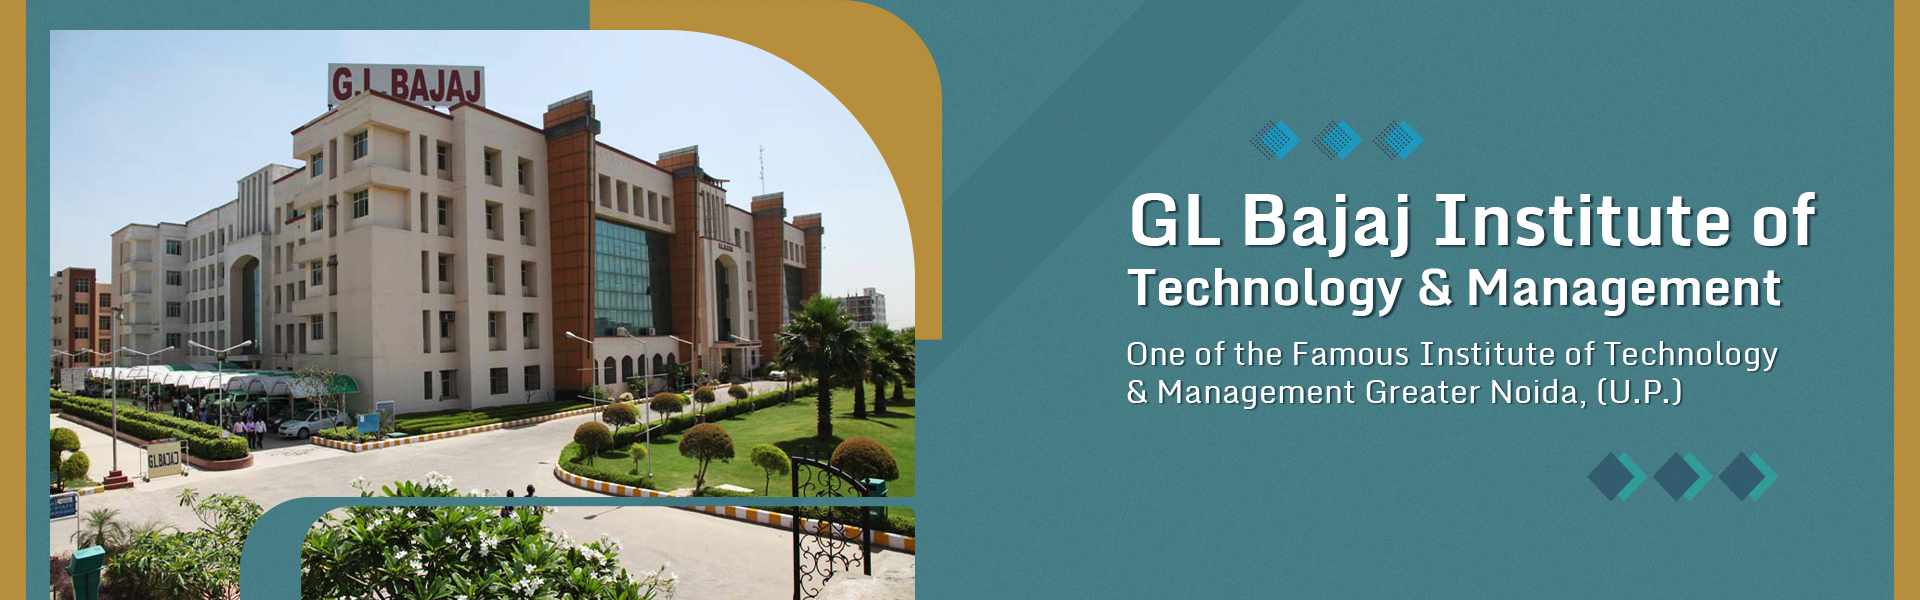 GL Bajaj Institute of Technology & Management GLBITM 2021